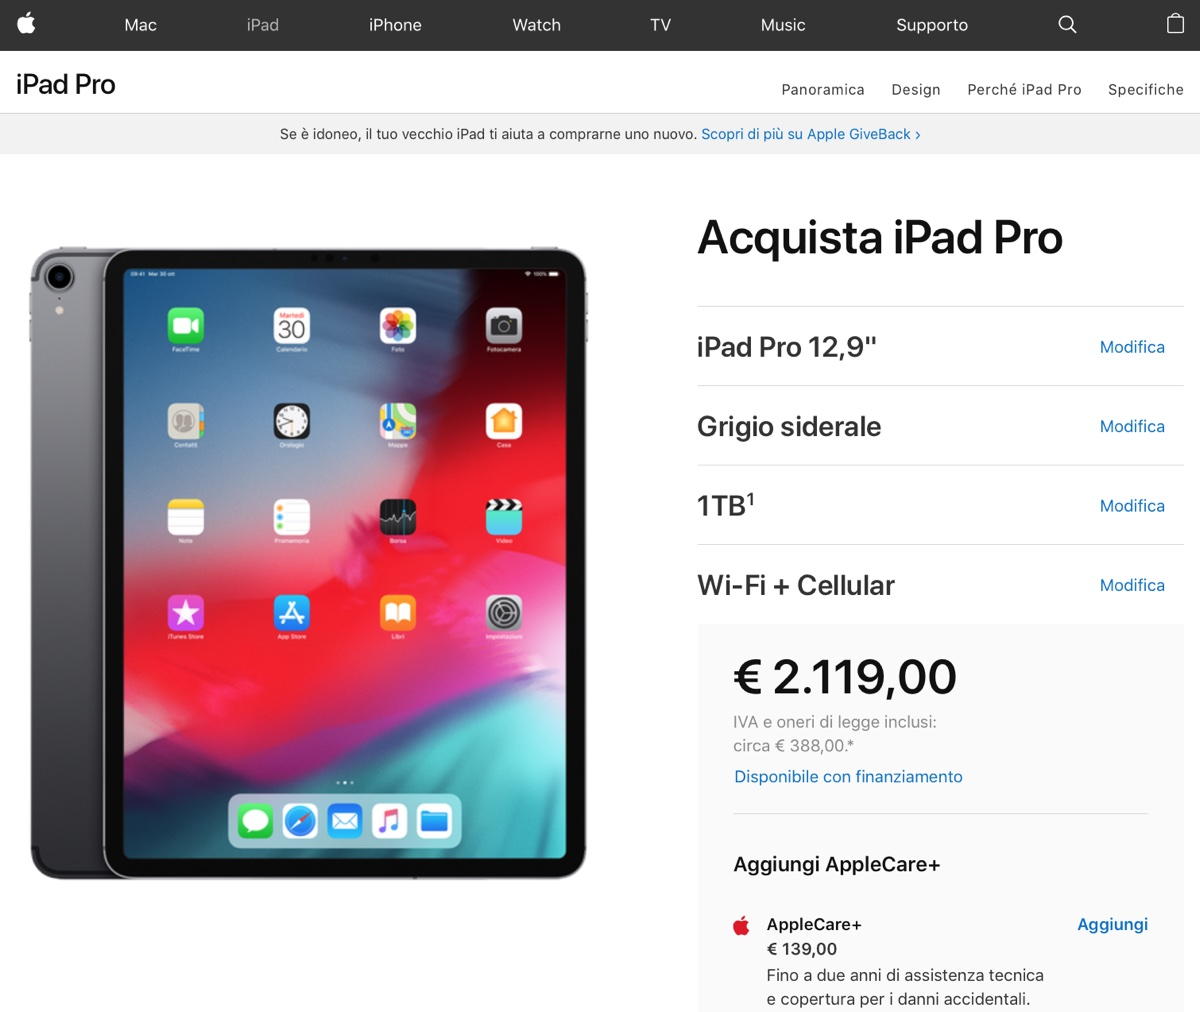 prezzi Apple record: MacBook Air 3.119 euro, Mac mini 4.989 euro, iPad Pro 2.119 euro